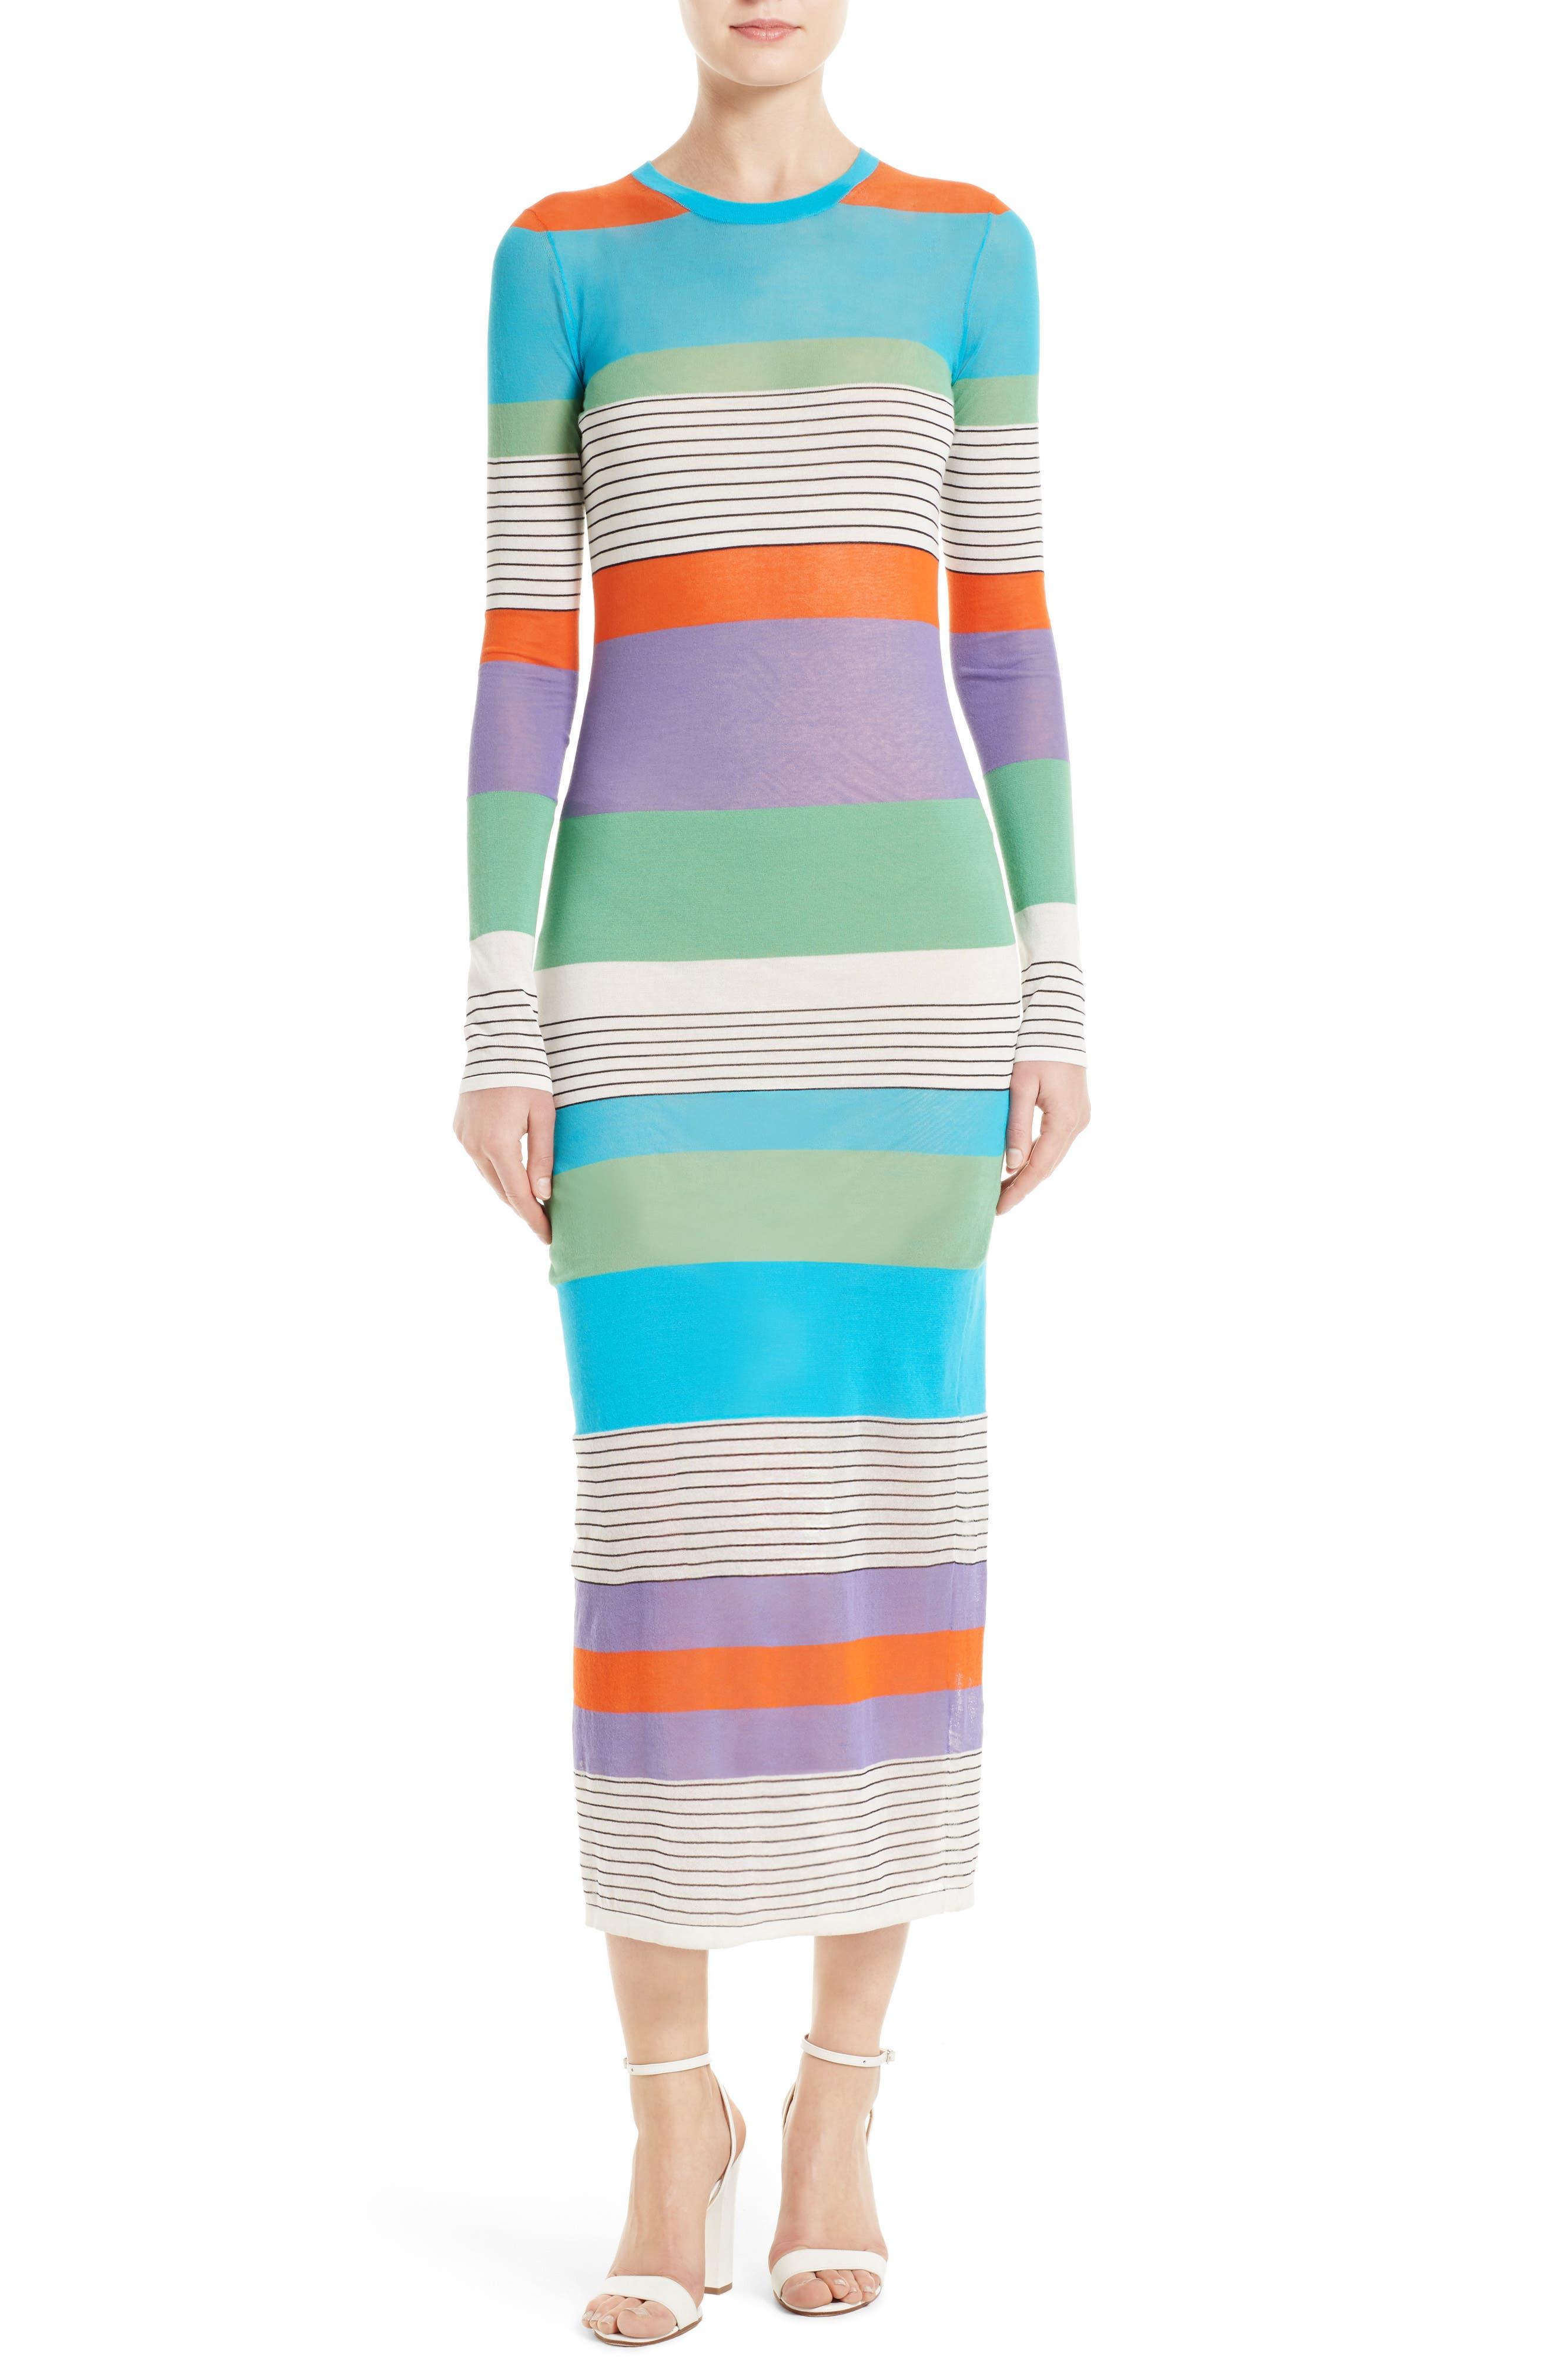 Alternate Image 1 Selected - Diane von Furstenberg Colorblock Knit Midi Dress